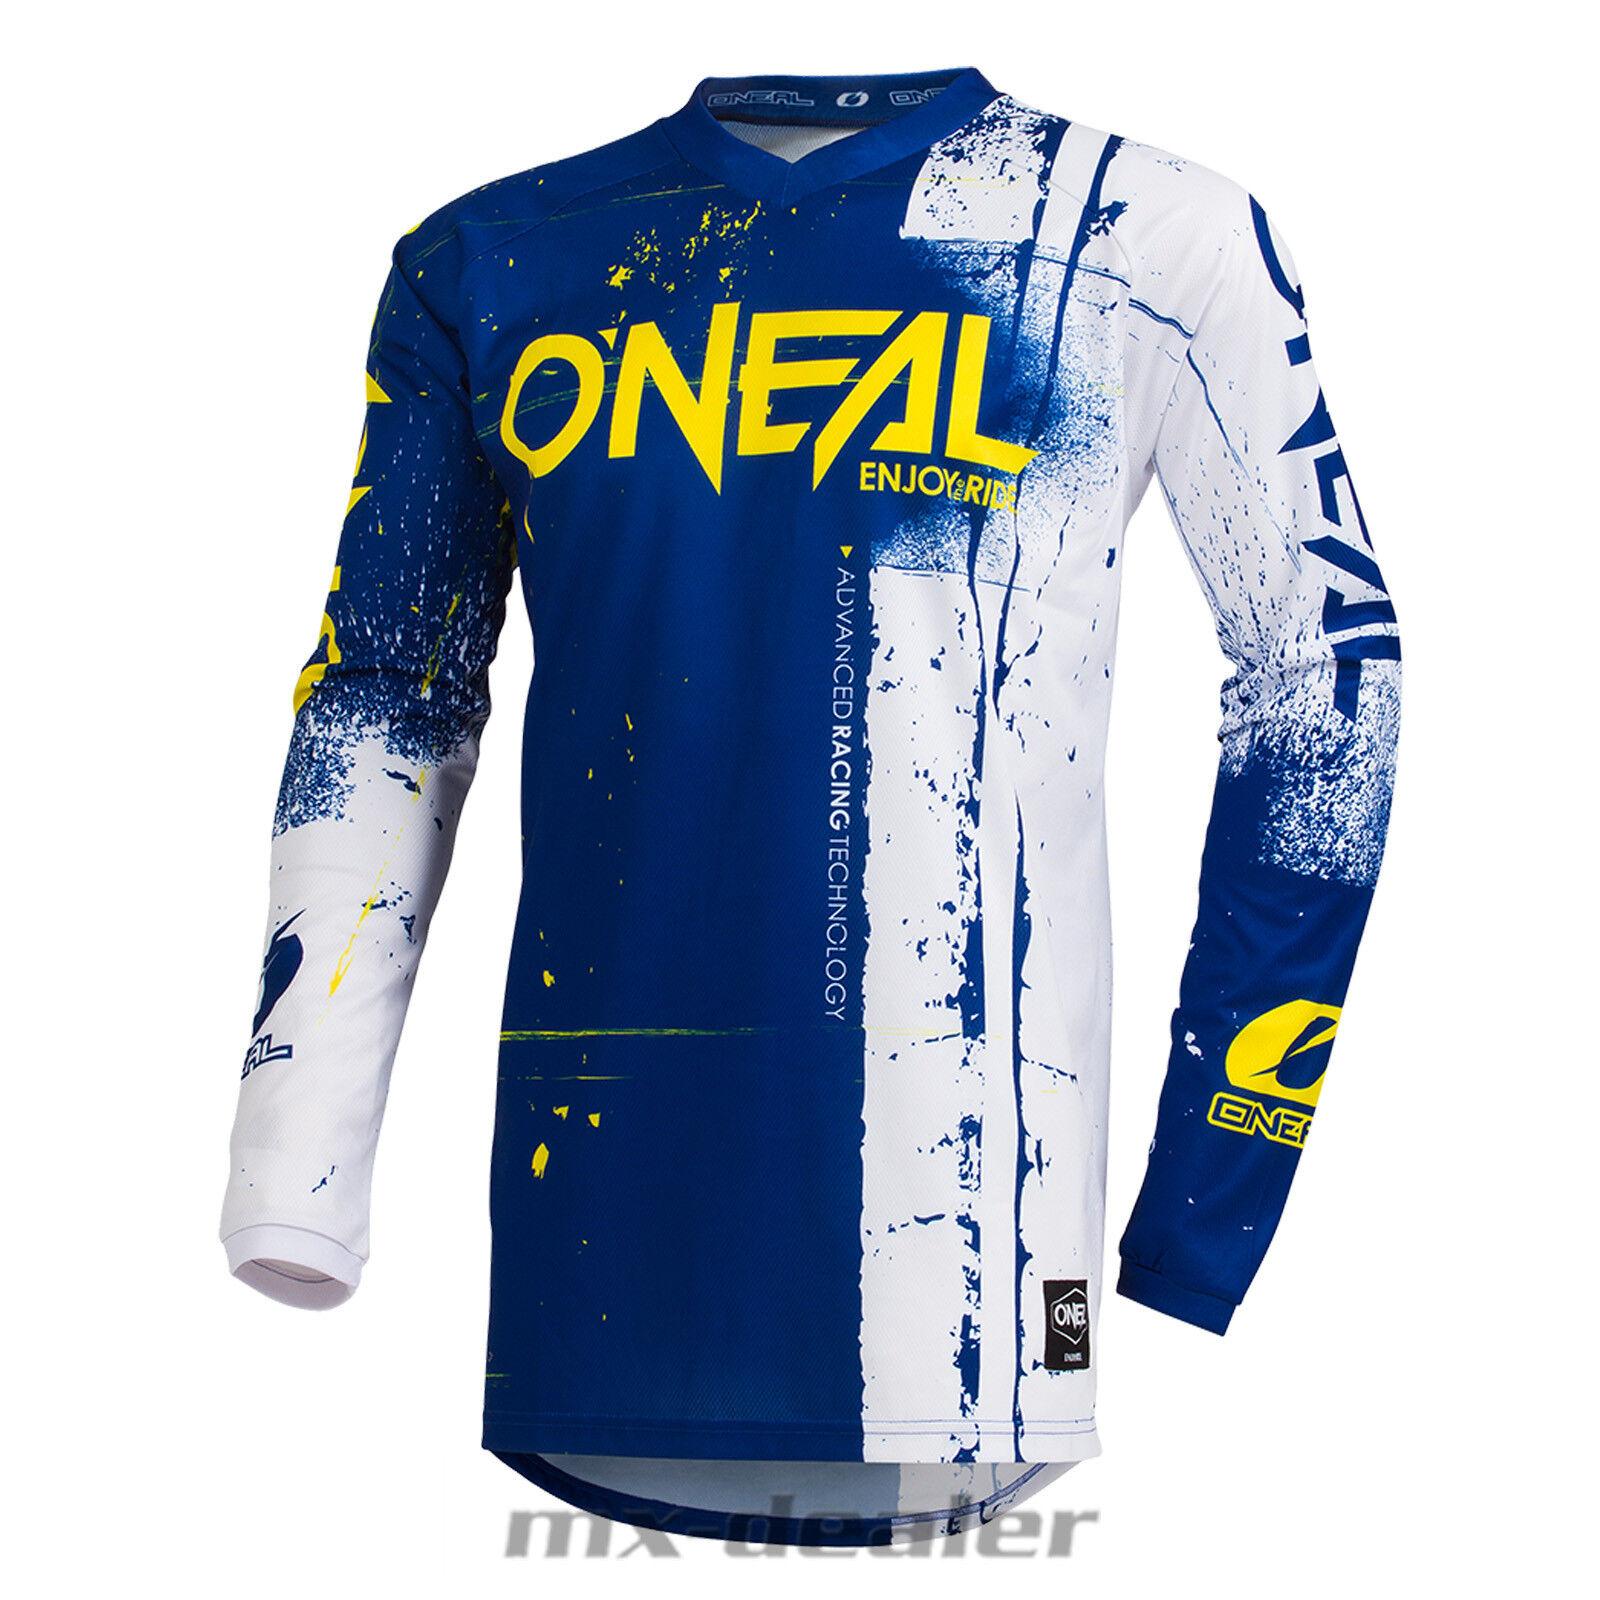 2019 O'Neal Element Shred blue yellow Jersey Trikot mx motocross mtb DH Enduro BMX